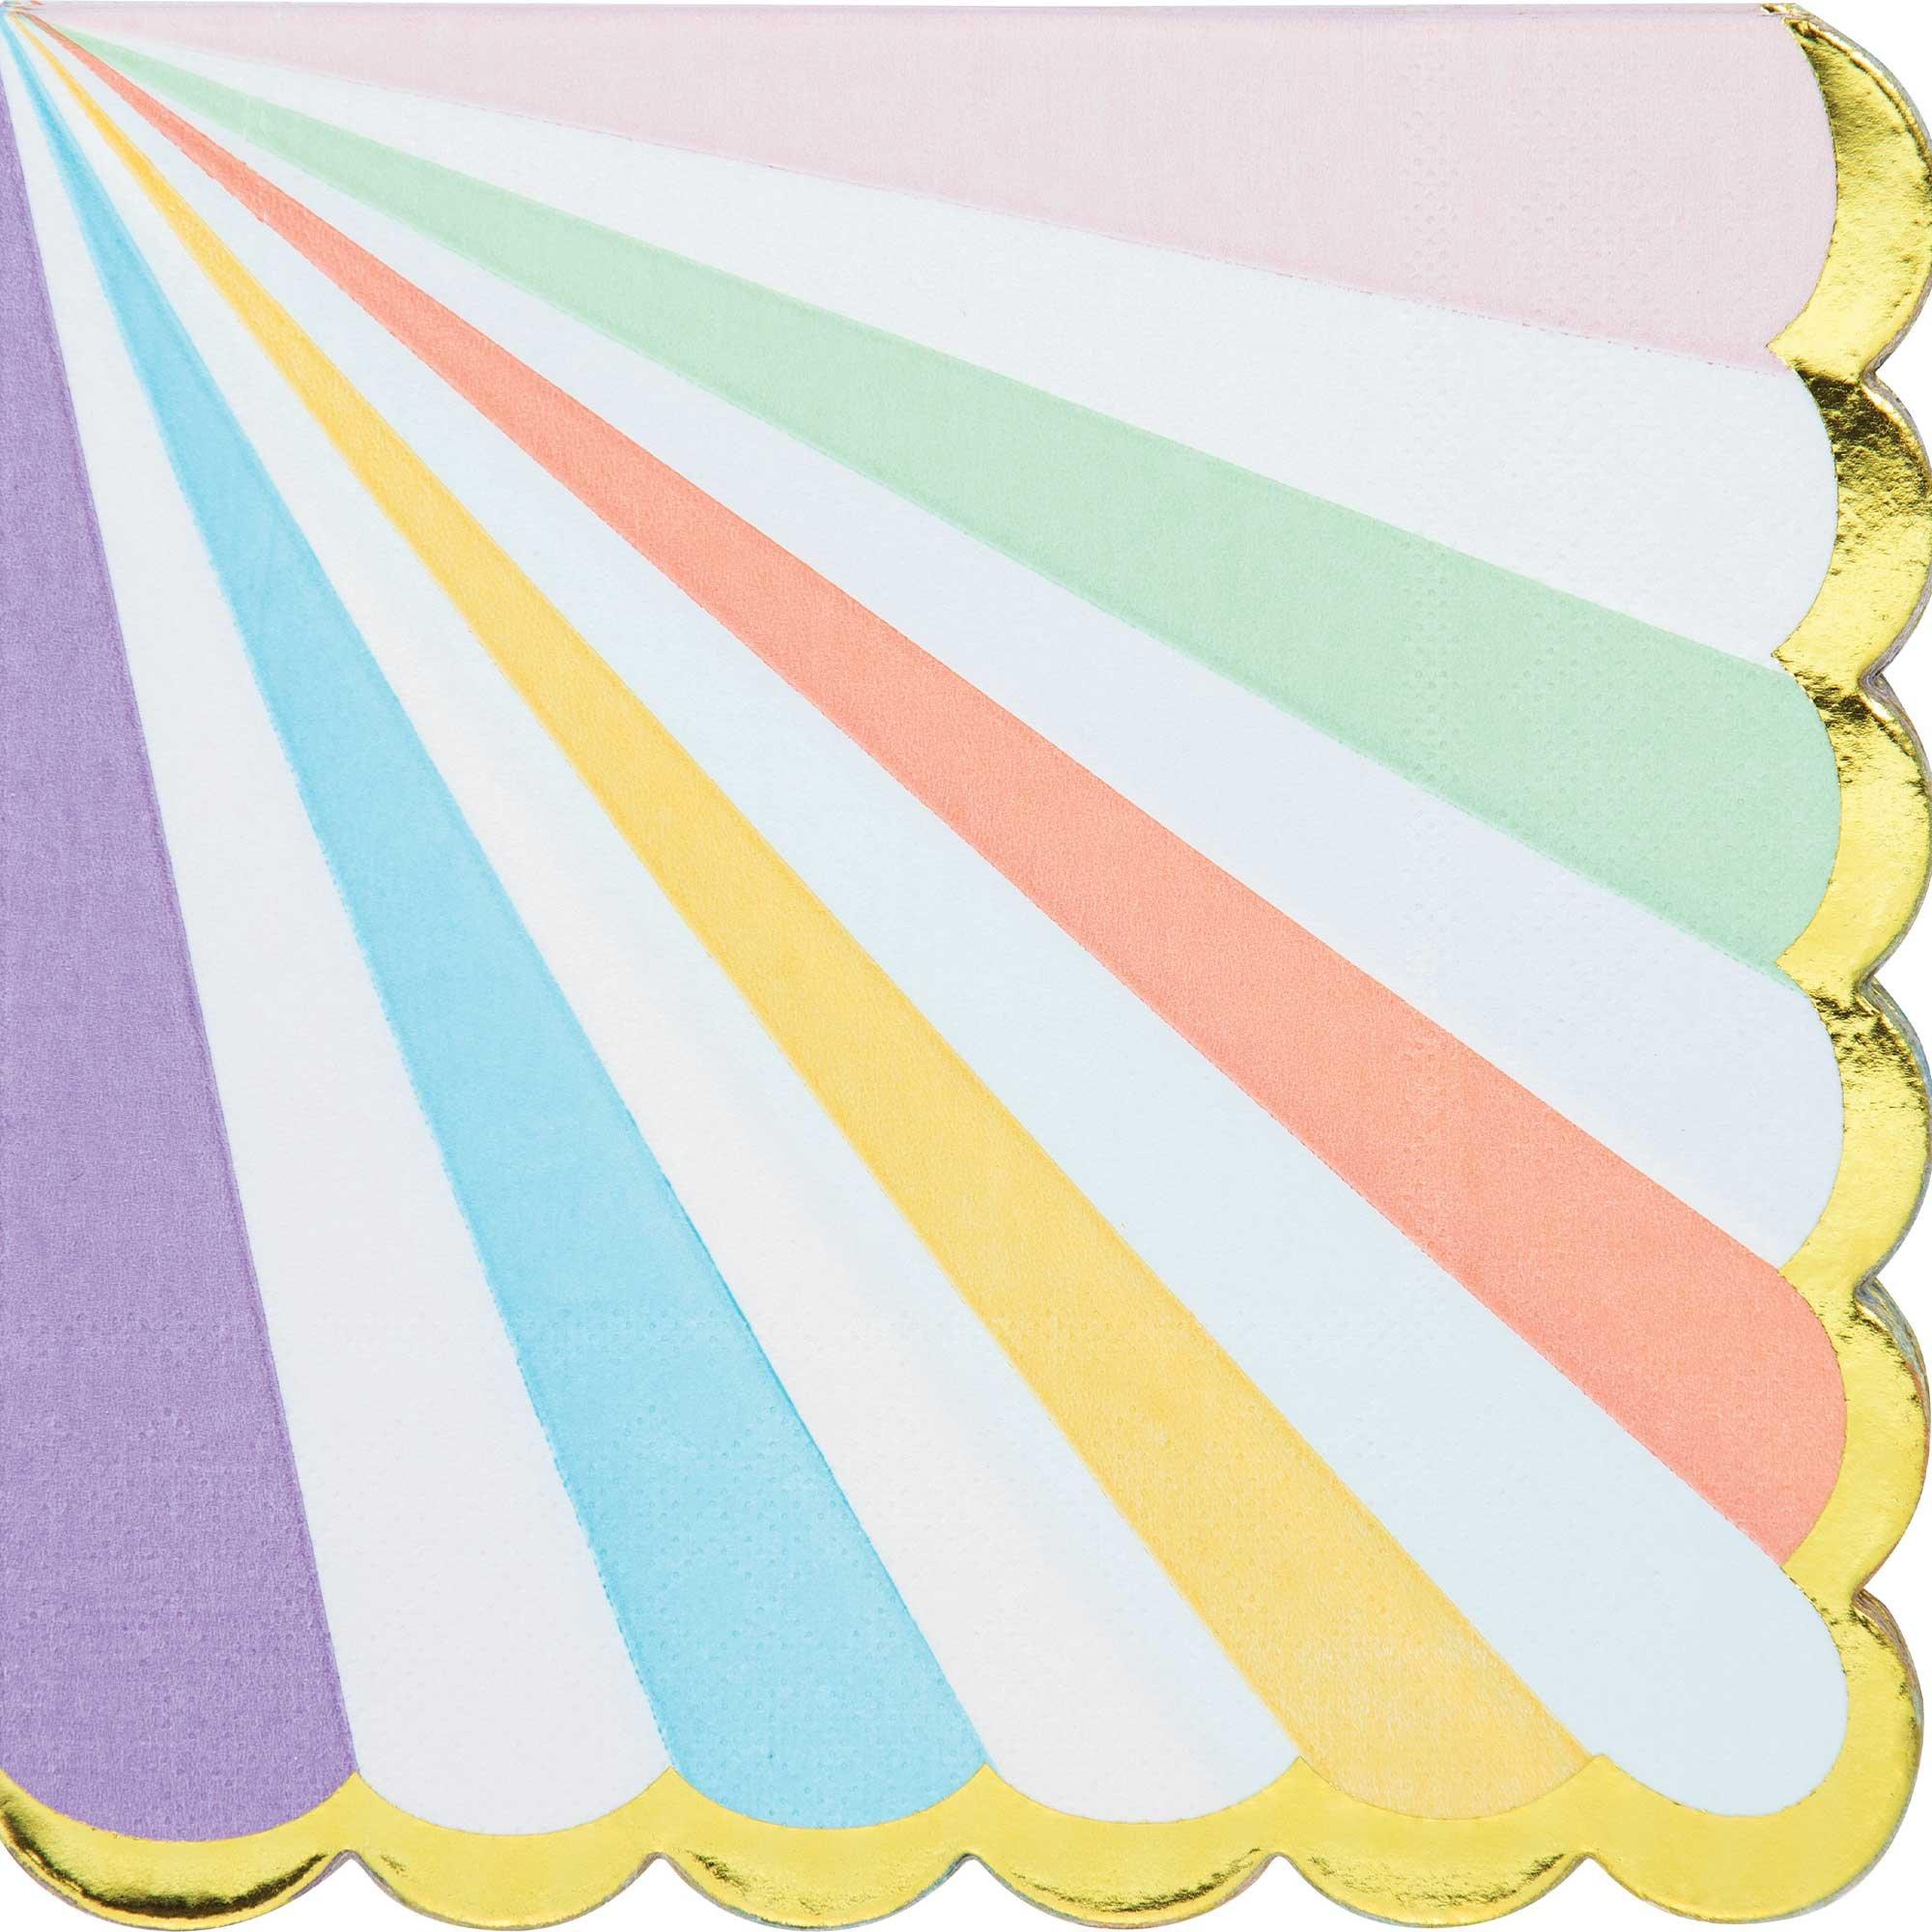 Pastel Celebrations Lunch Napkins Scalloped & Gold Foil